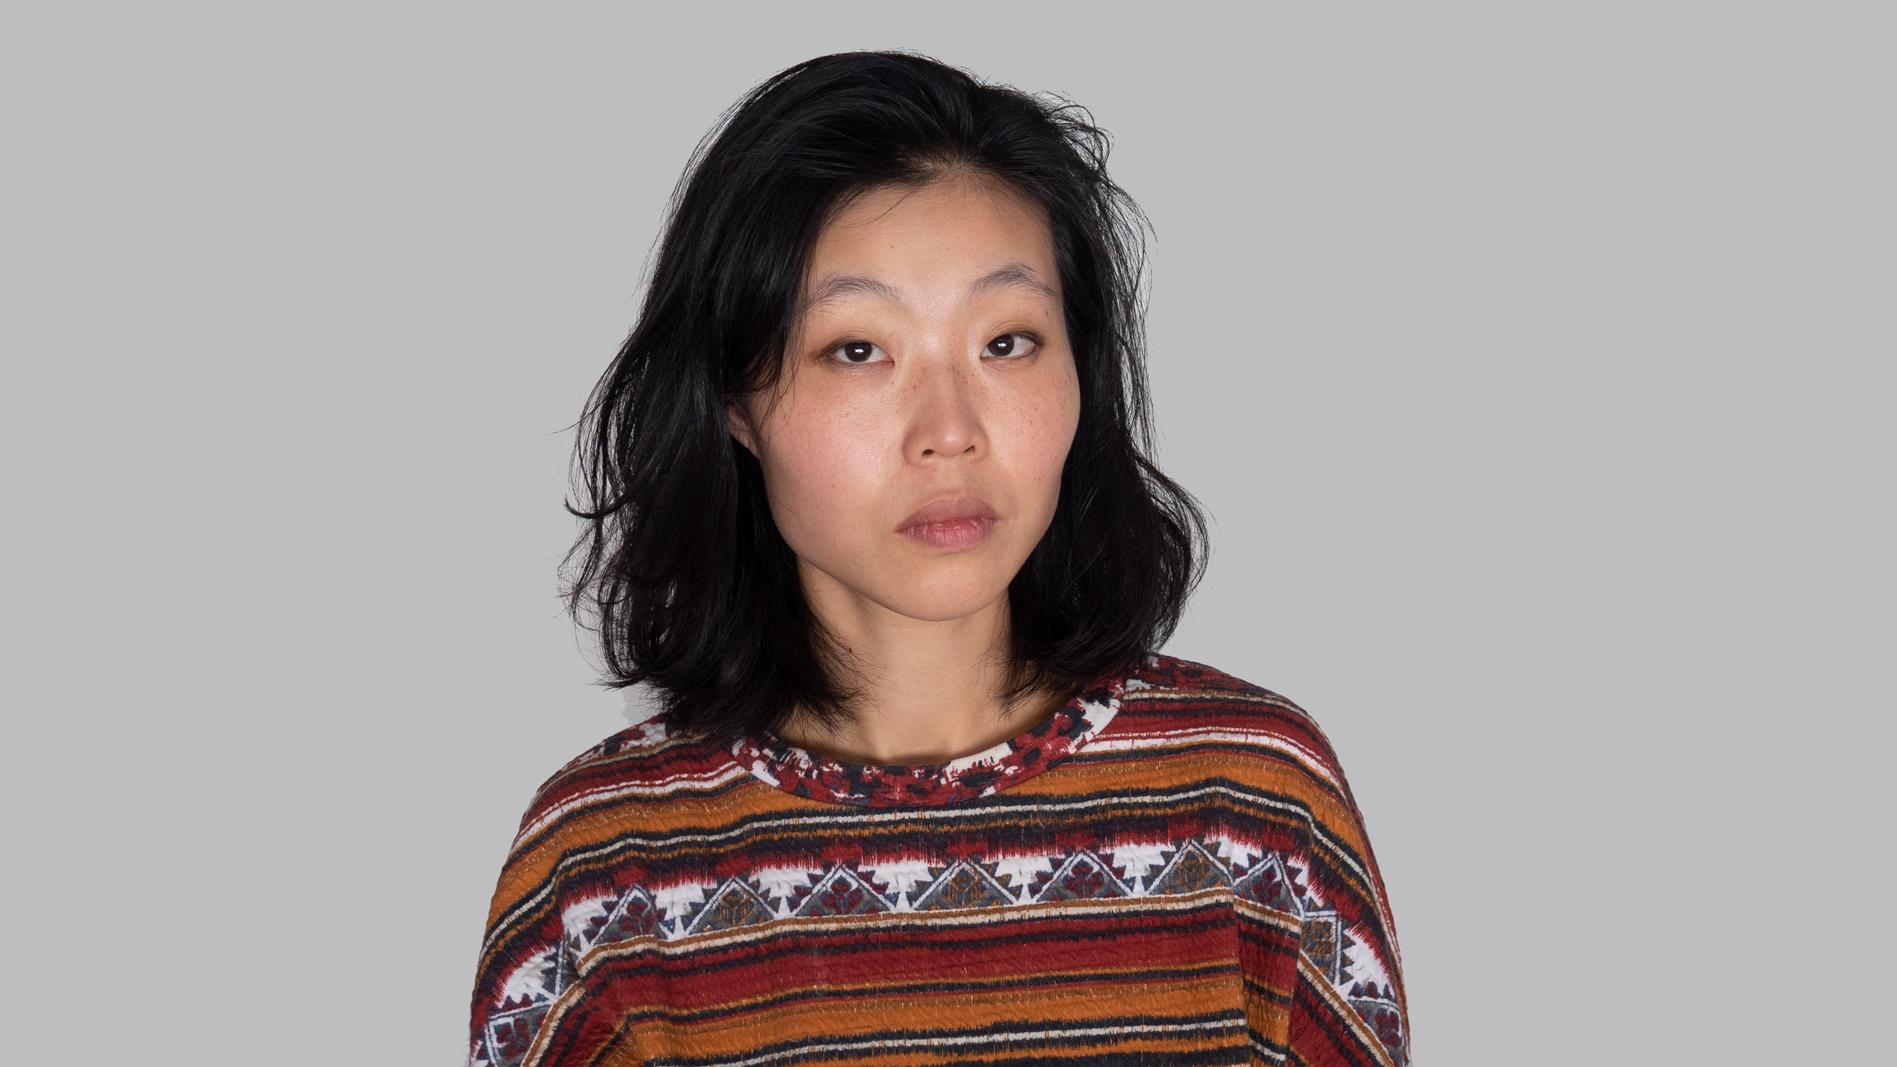 Portrait of Young Joo Lee